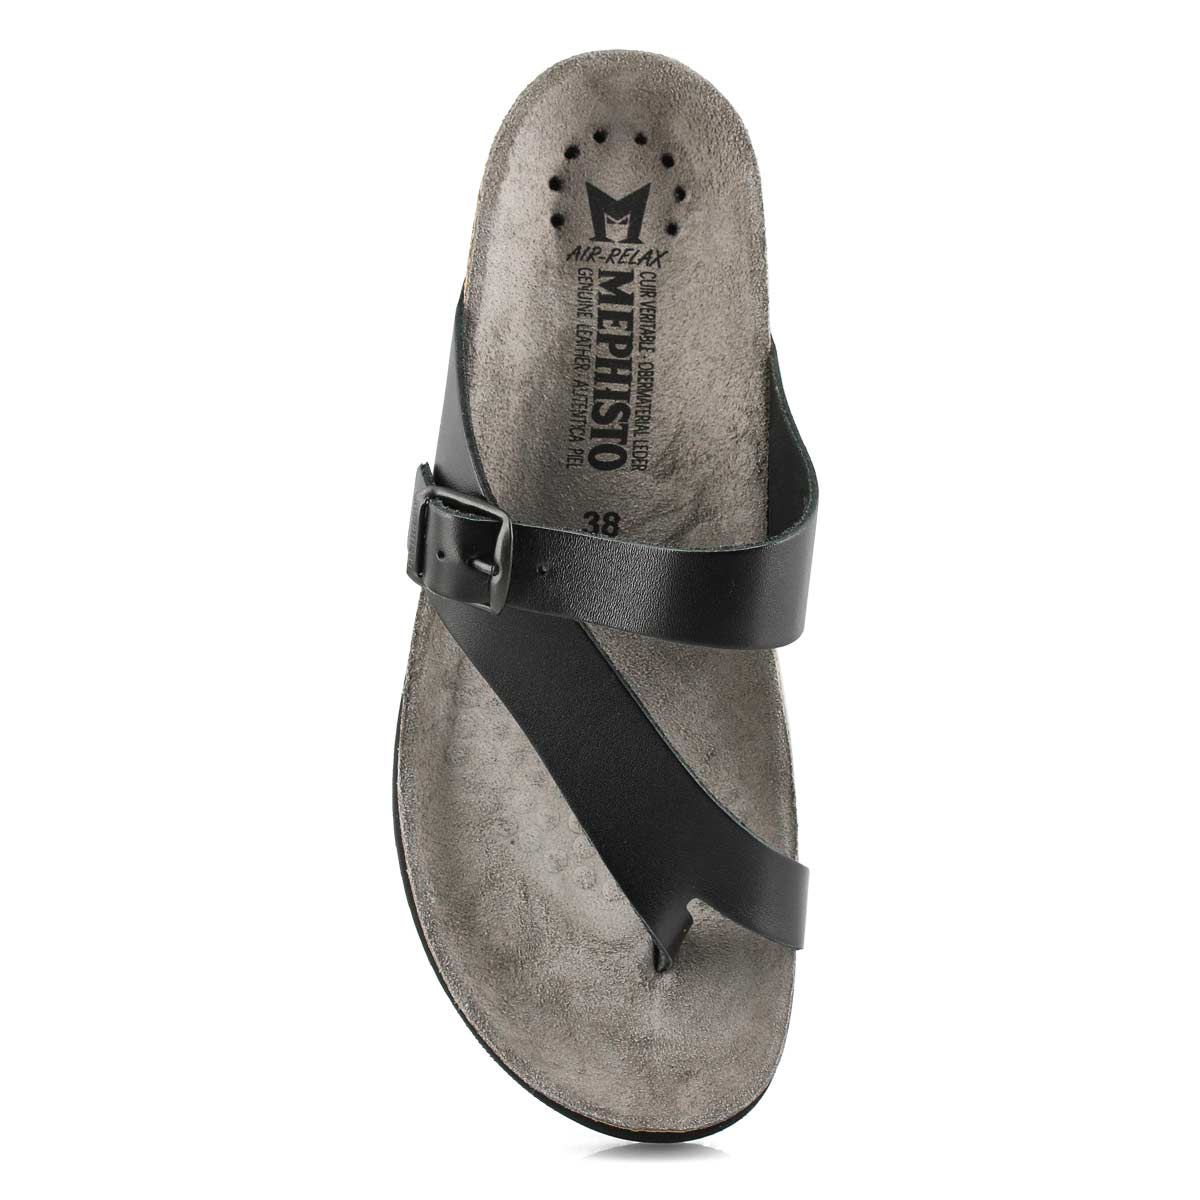 Lds Helen blk waxy cork footbed toe loop